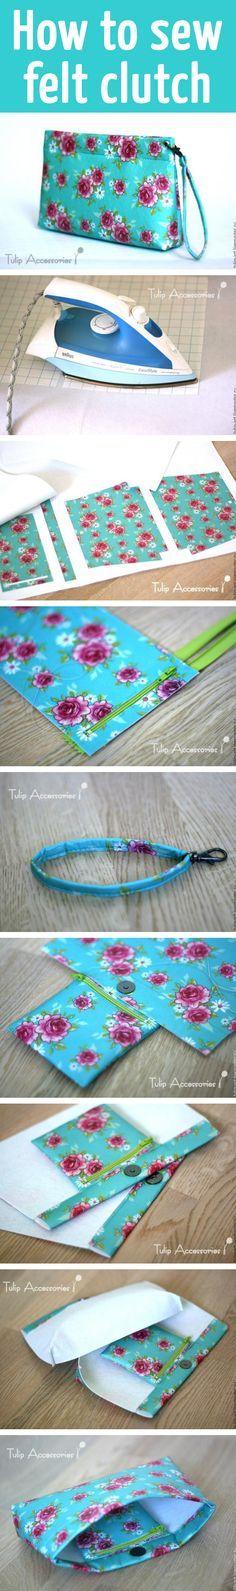 How to sew felt clutch